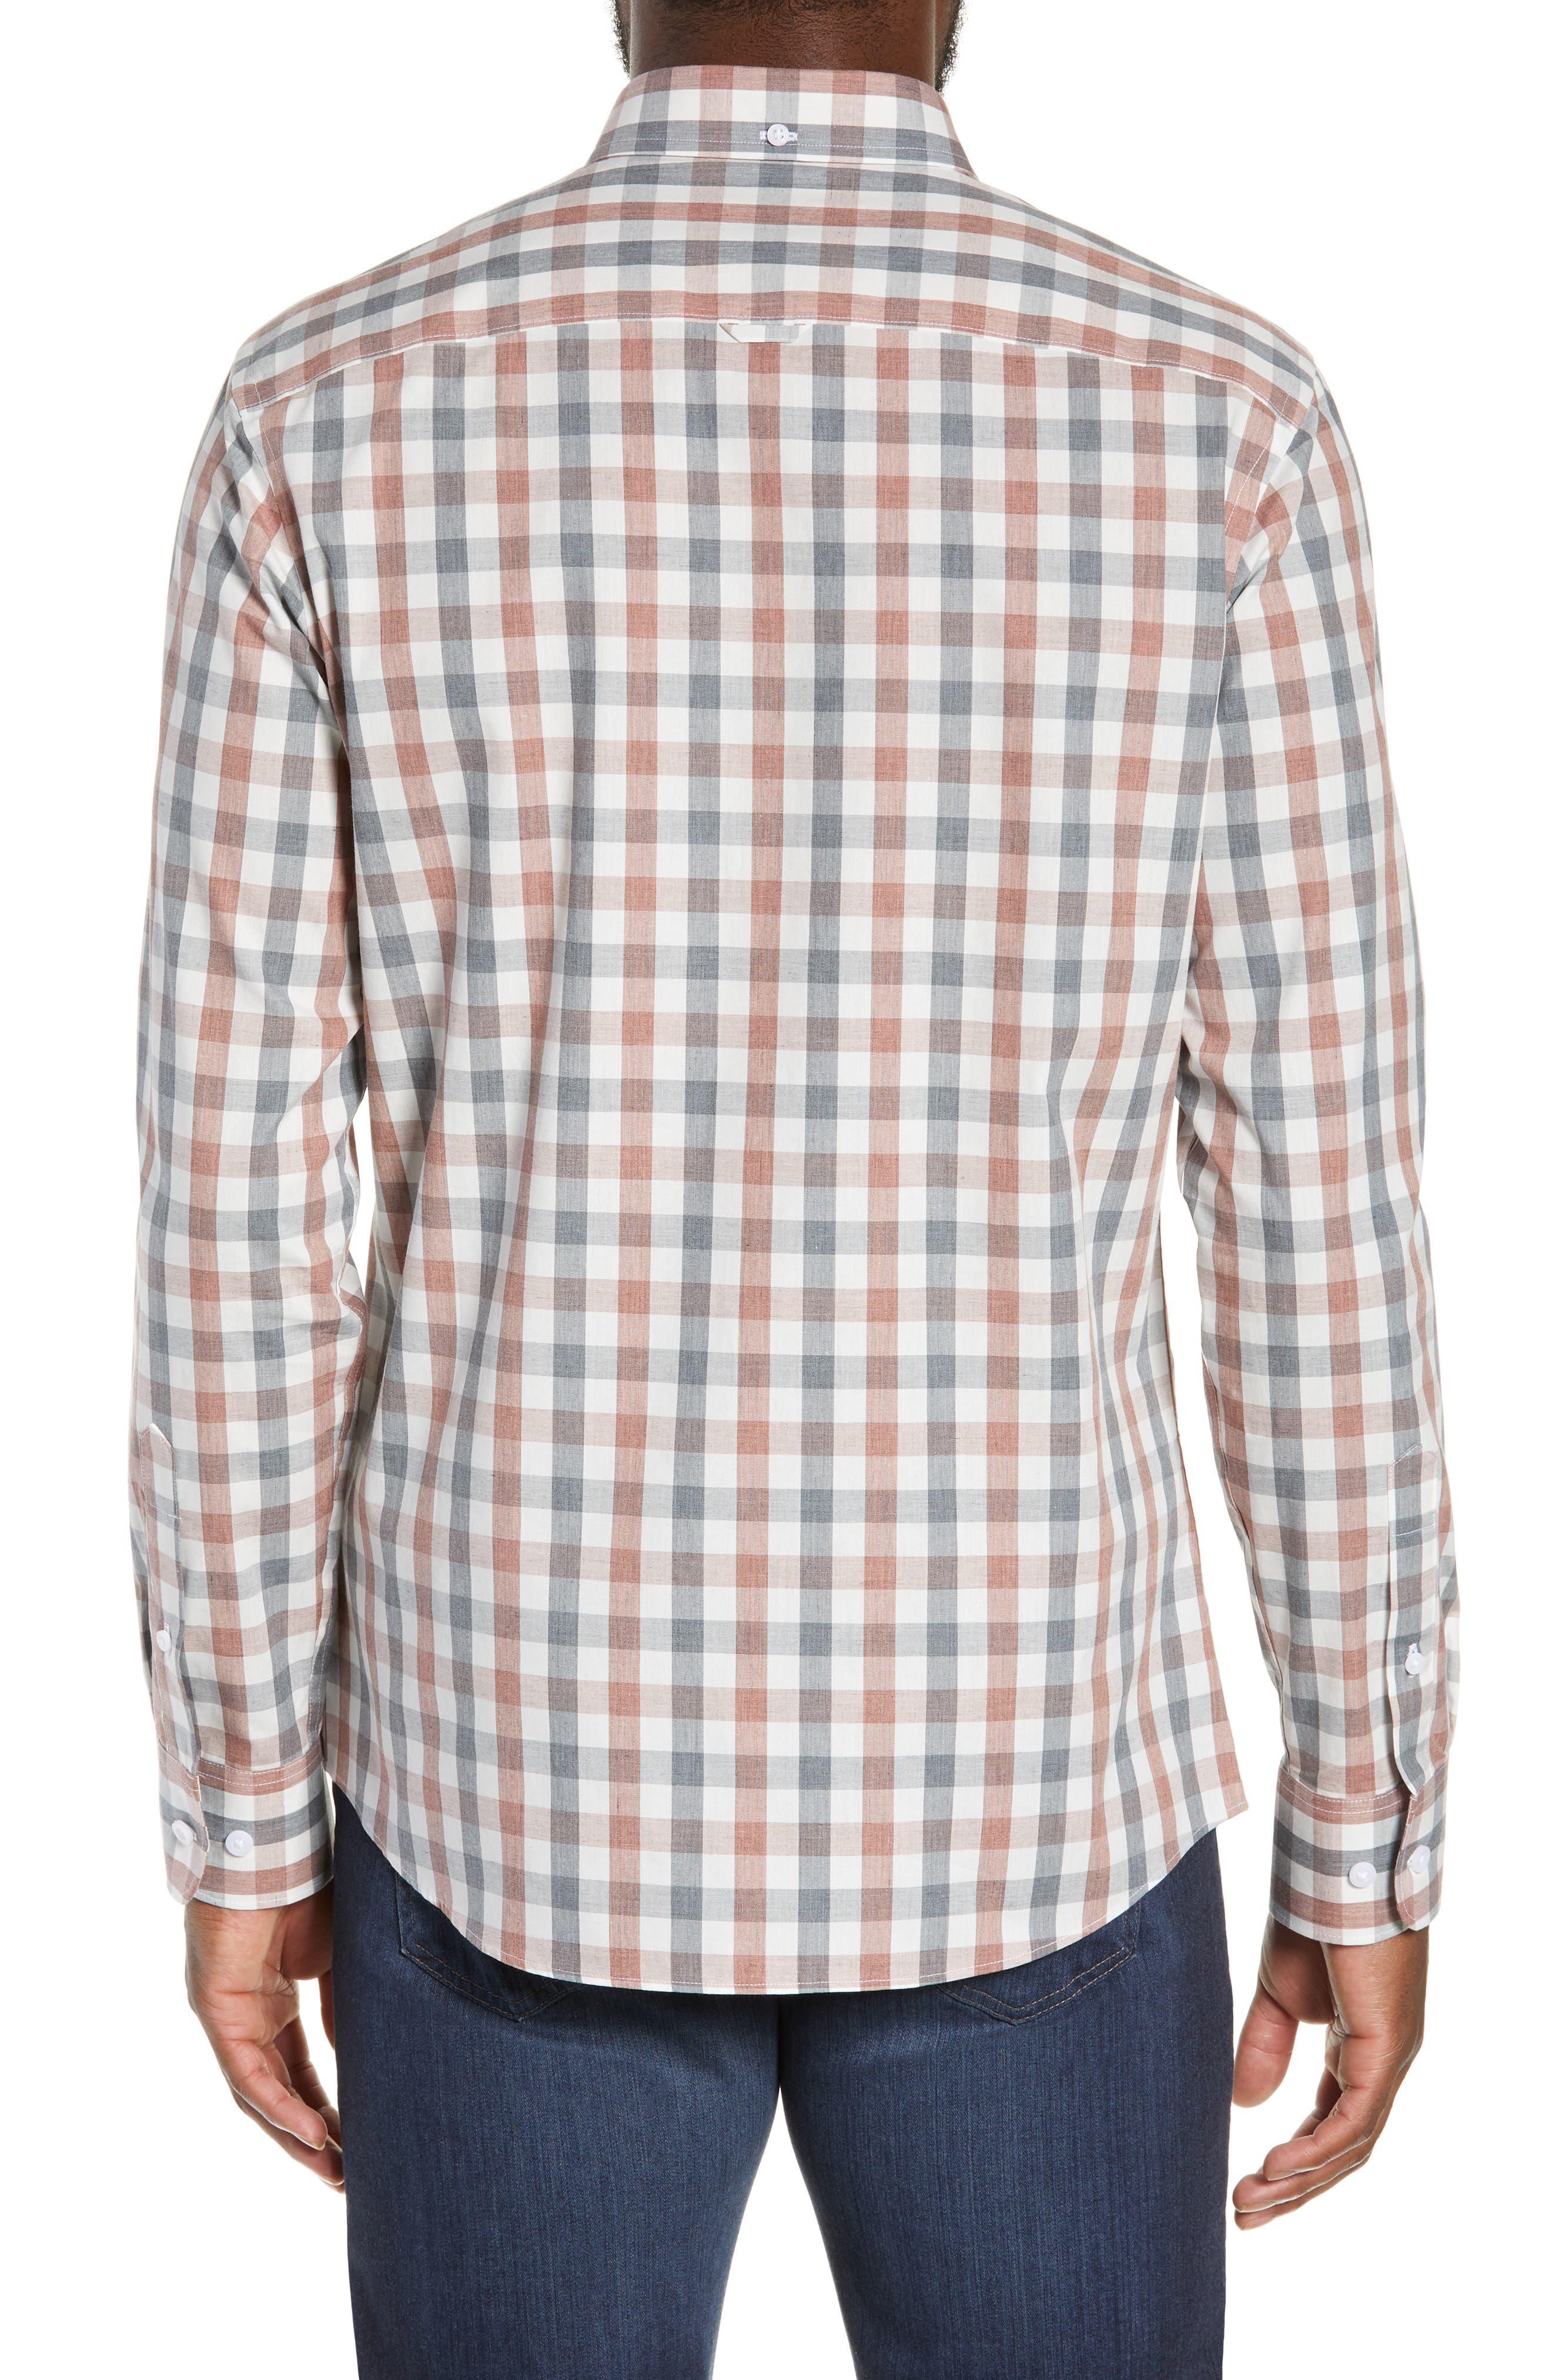 Check Sport Shirt,                             Alternate thumbnail 3, color,                             GREY RED WHITE MELANGE CHECK